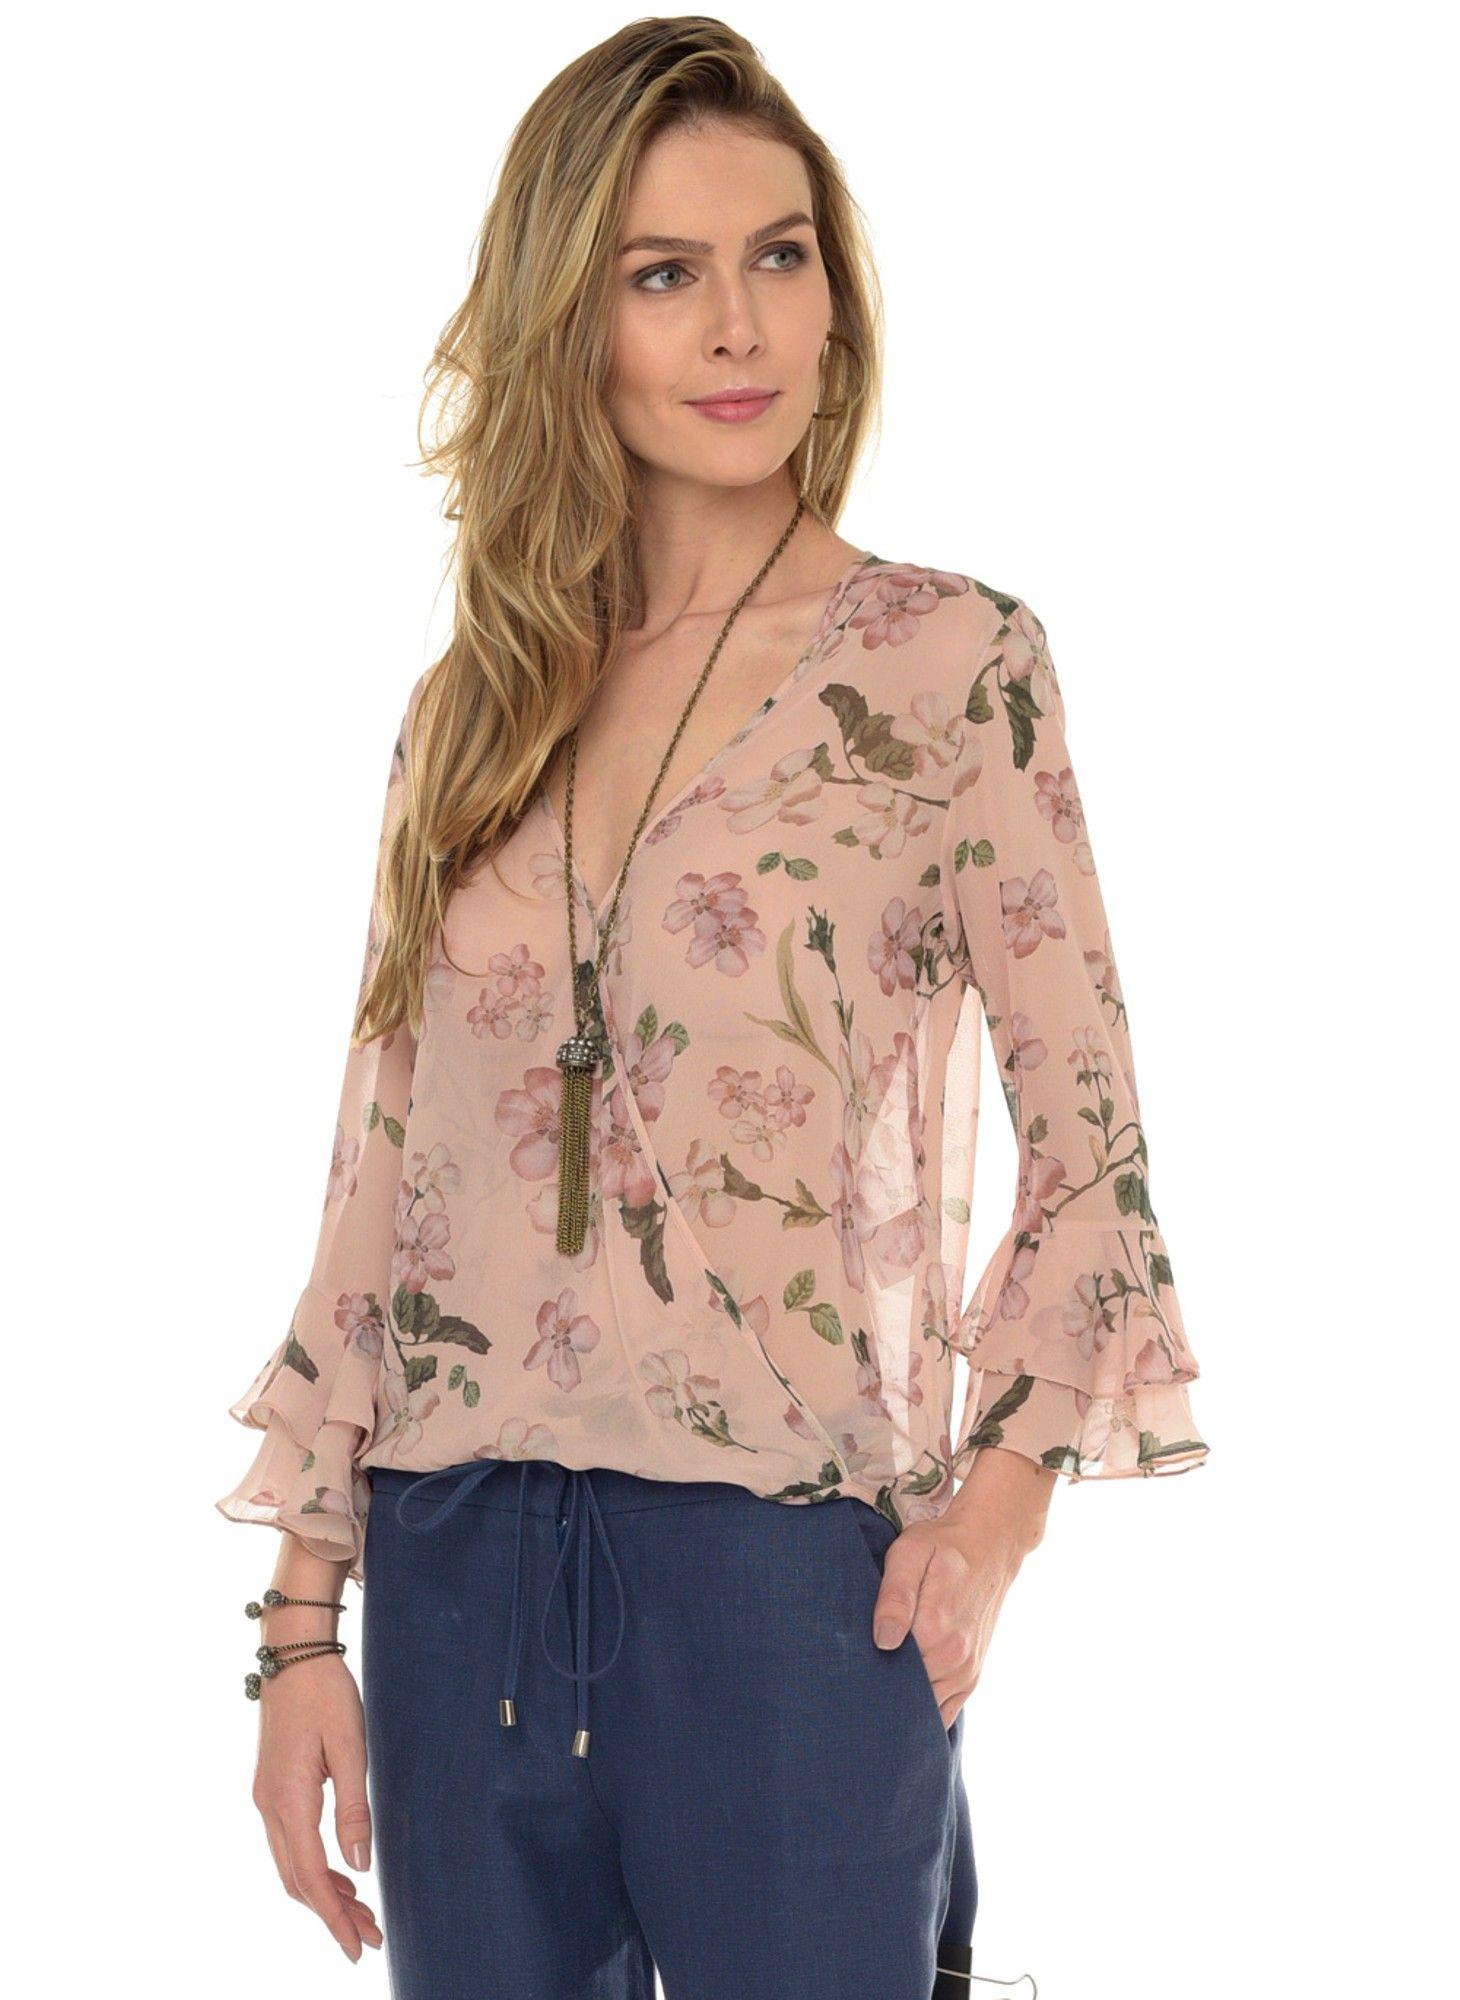 4057db2ad9df Blusa Teodora Seda - lelis | Blusas e camisetas | Blusas floridas ...